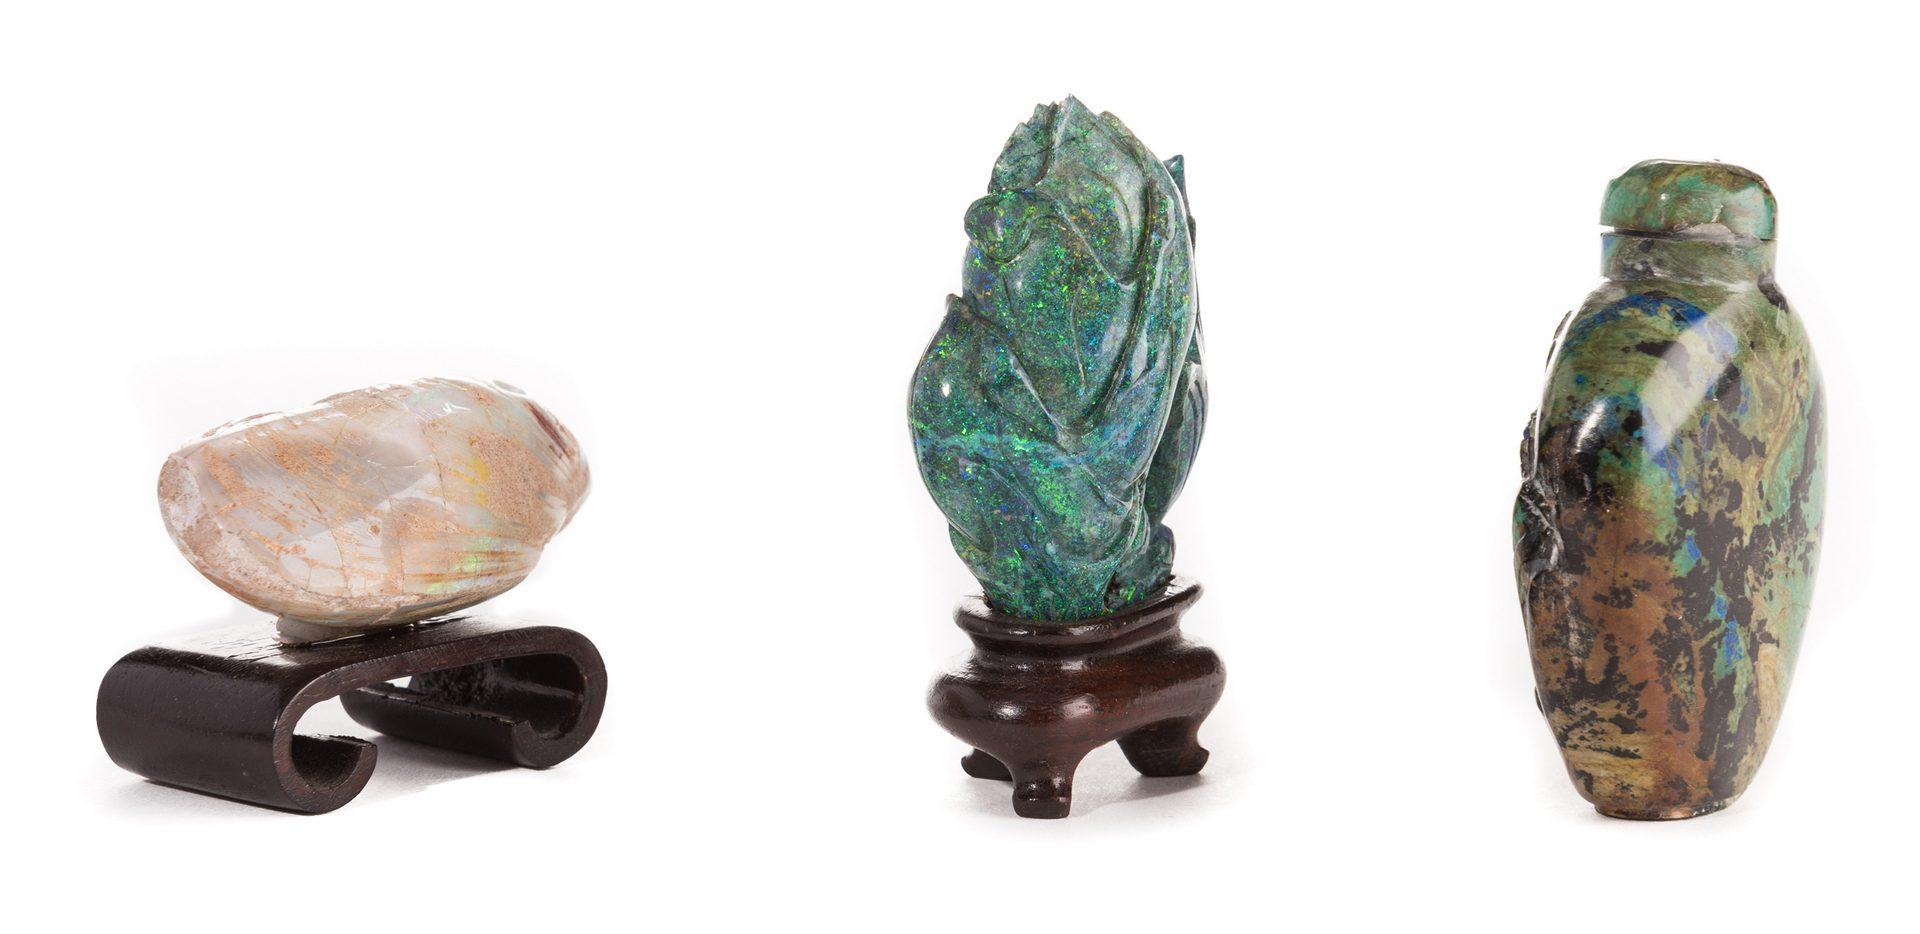 Lot 42: Turquoise Snuff Bottle plus Lapis and Quartz Carvings, 3 items